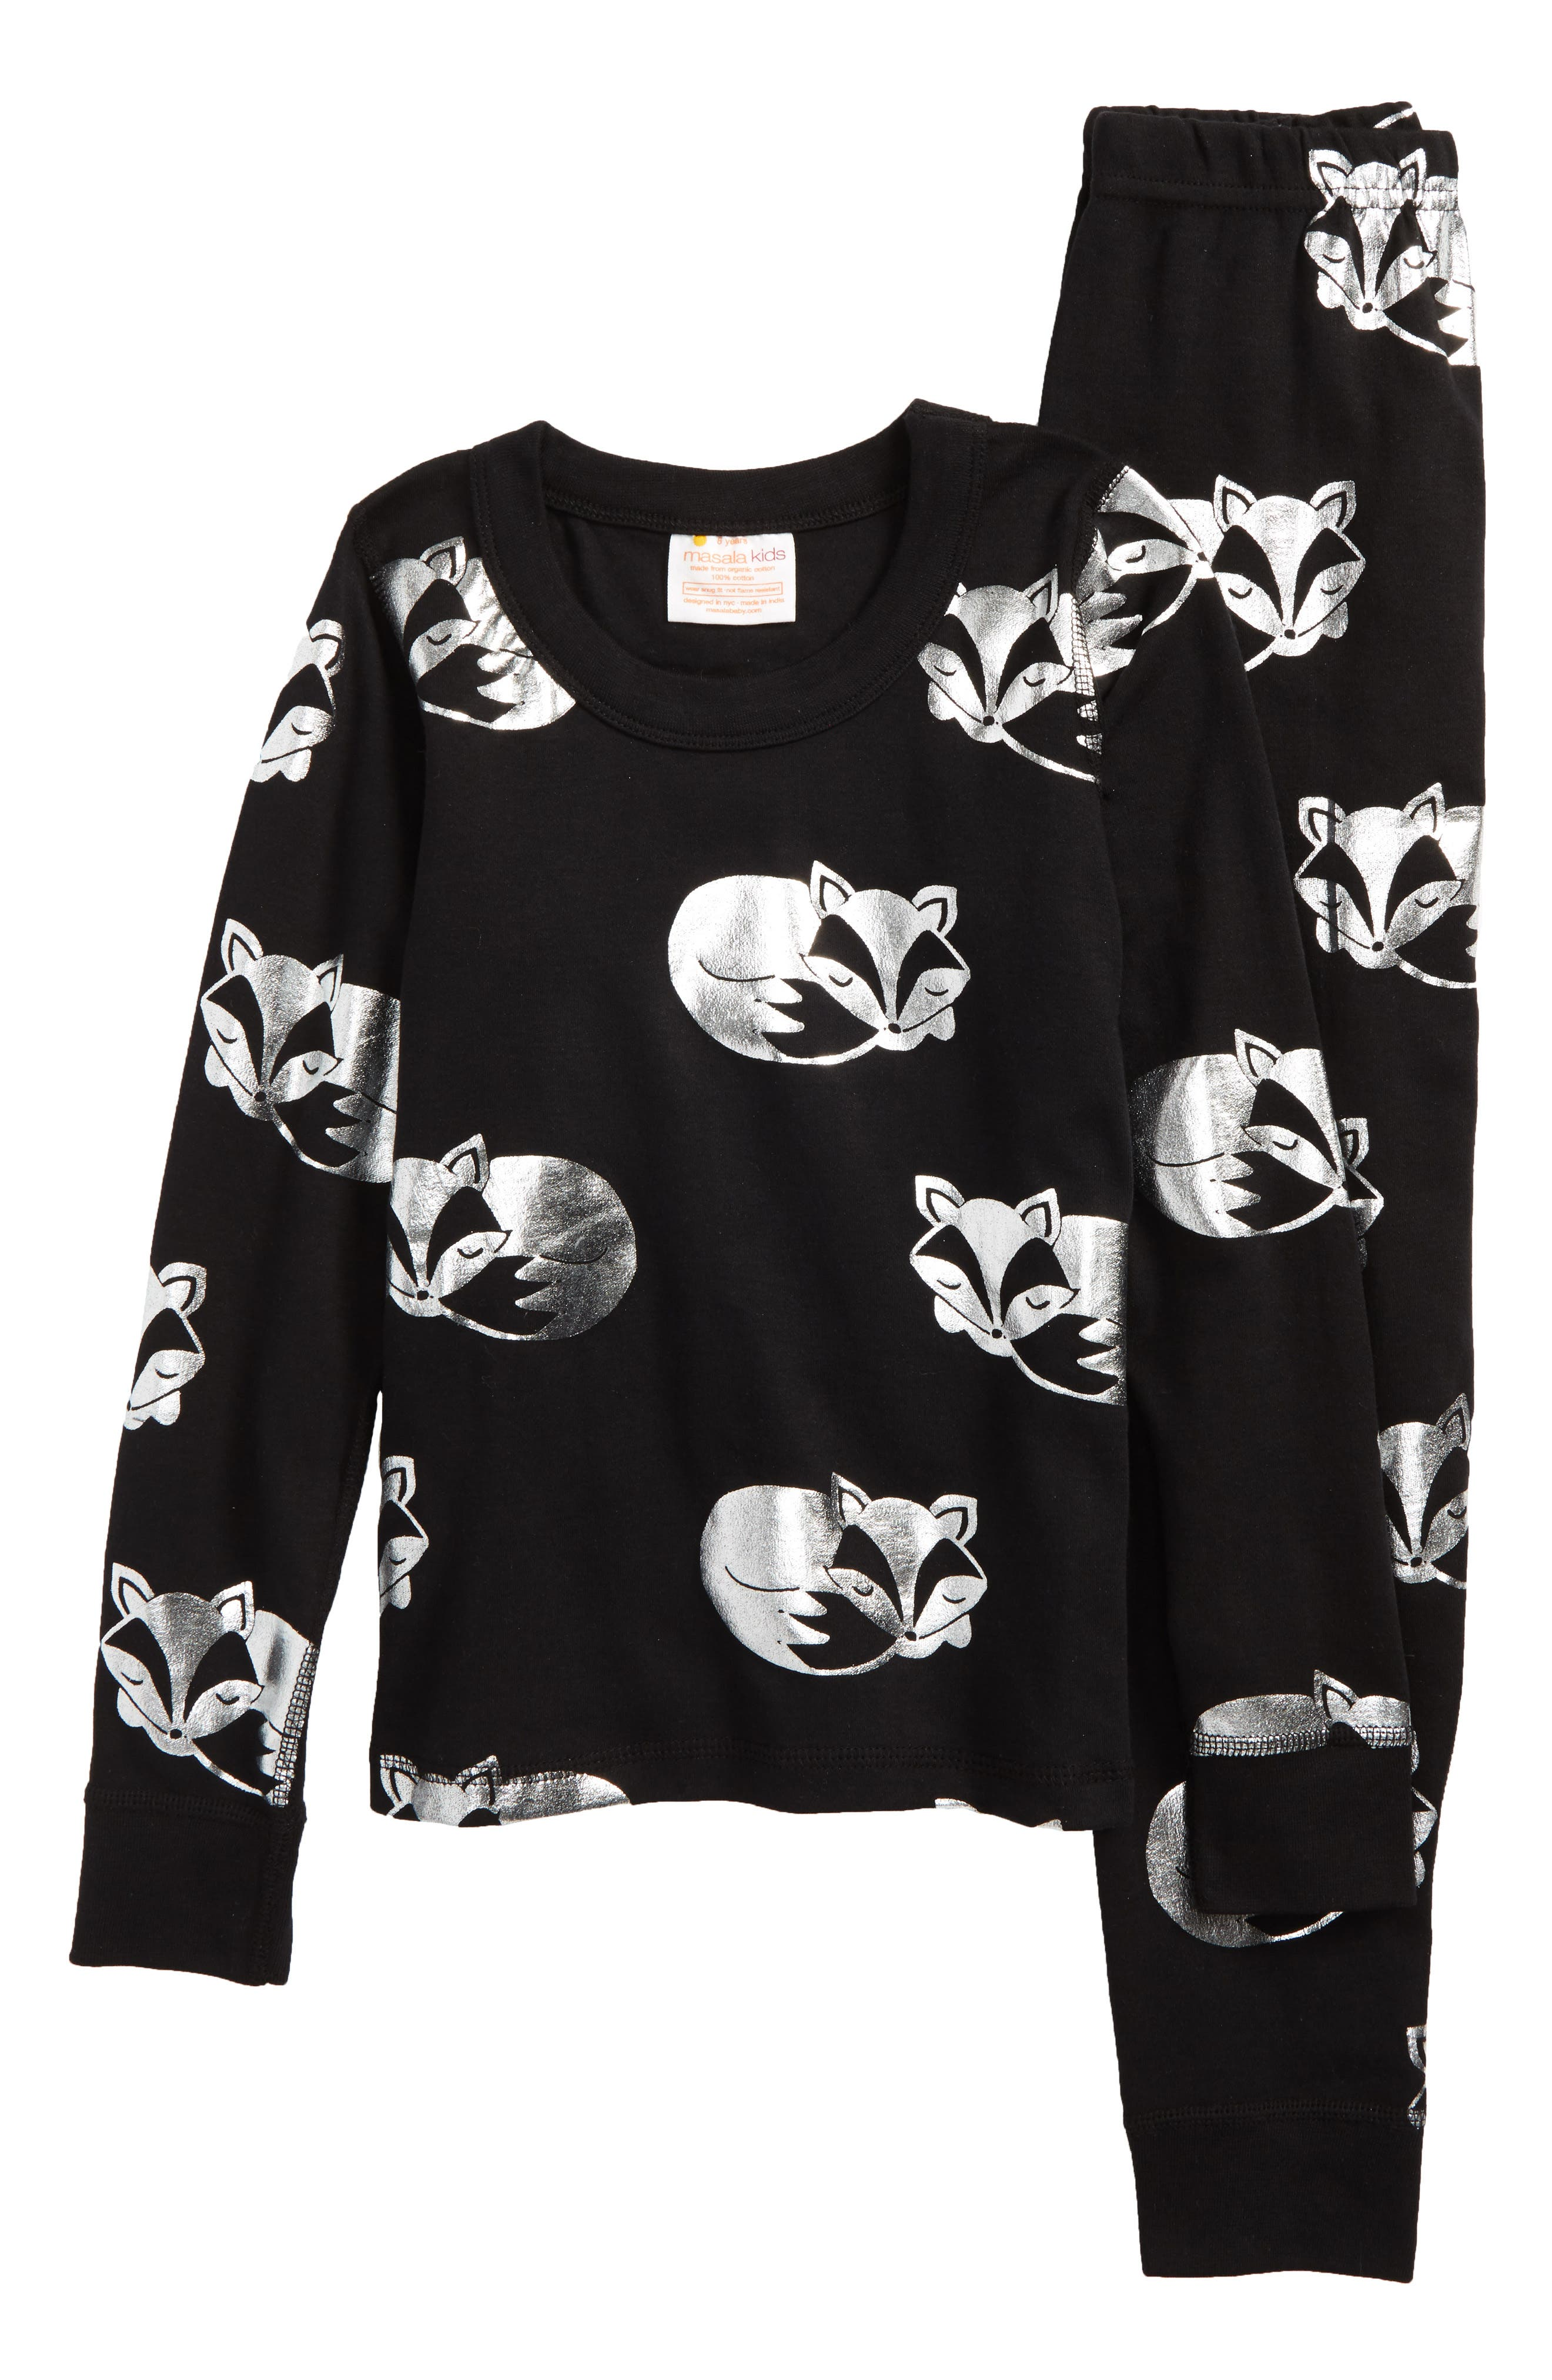 Main Image - Masala Baby Sleeping Foxes Fitted Two-Piece Pajamas (Toddler Girls, Little Girls & Big Girls)